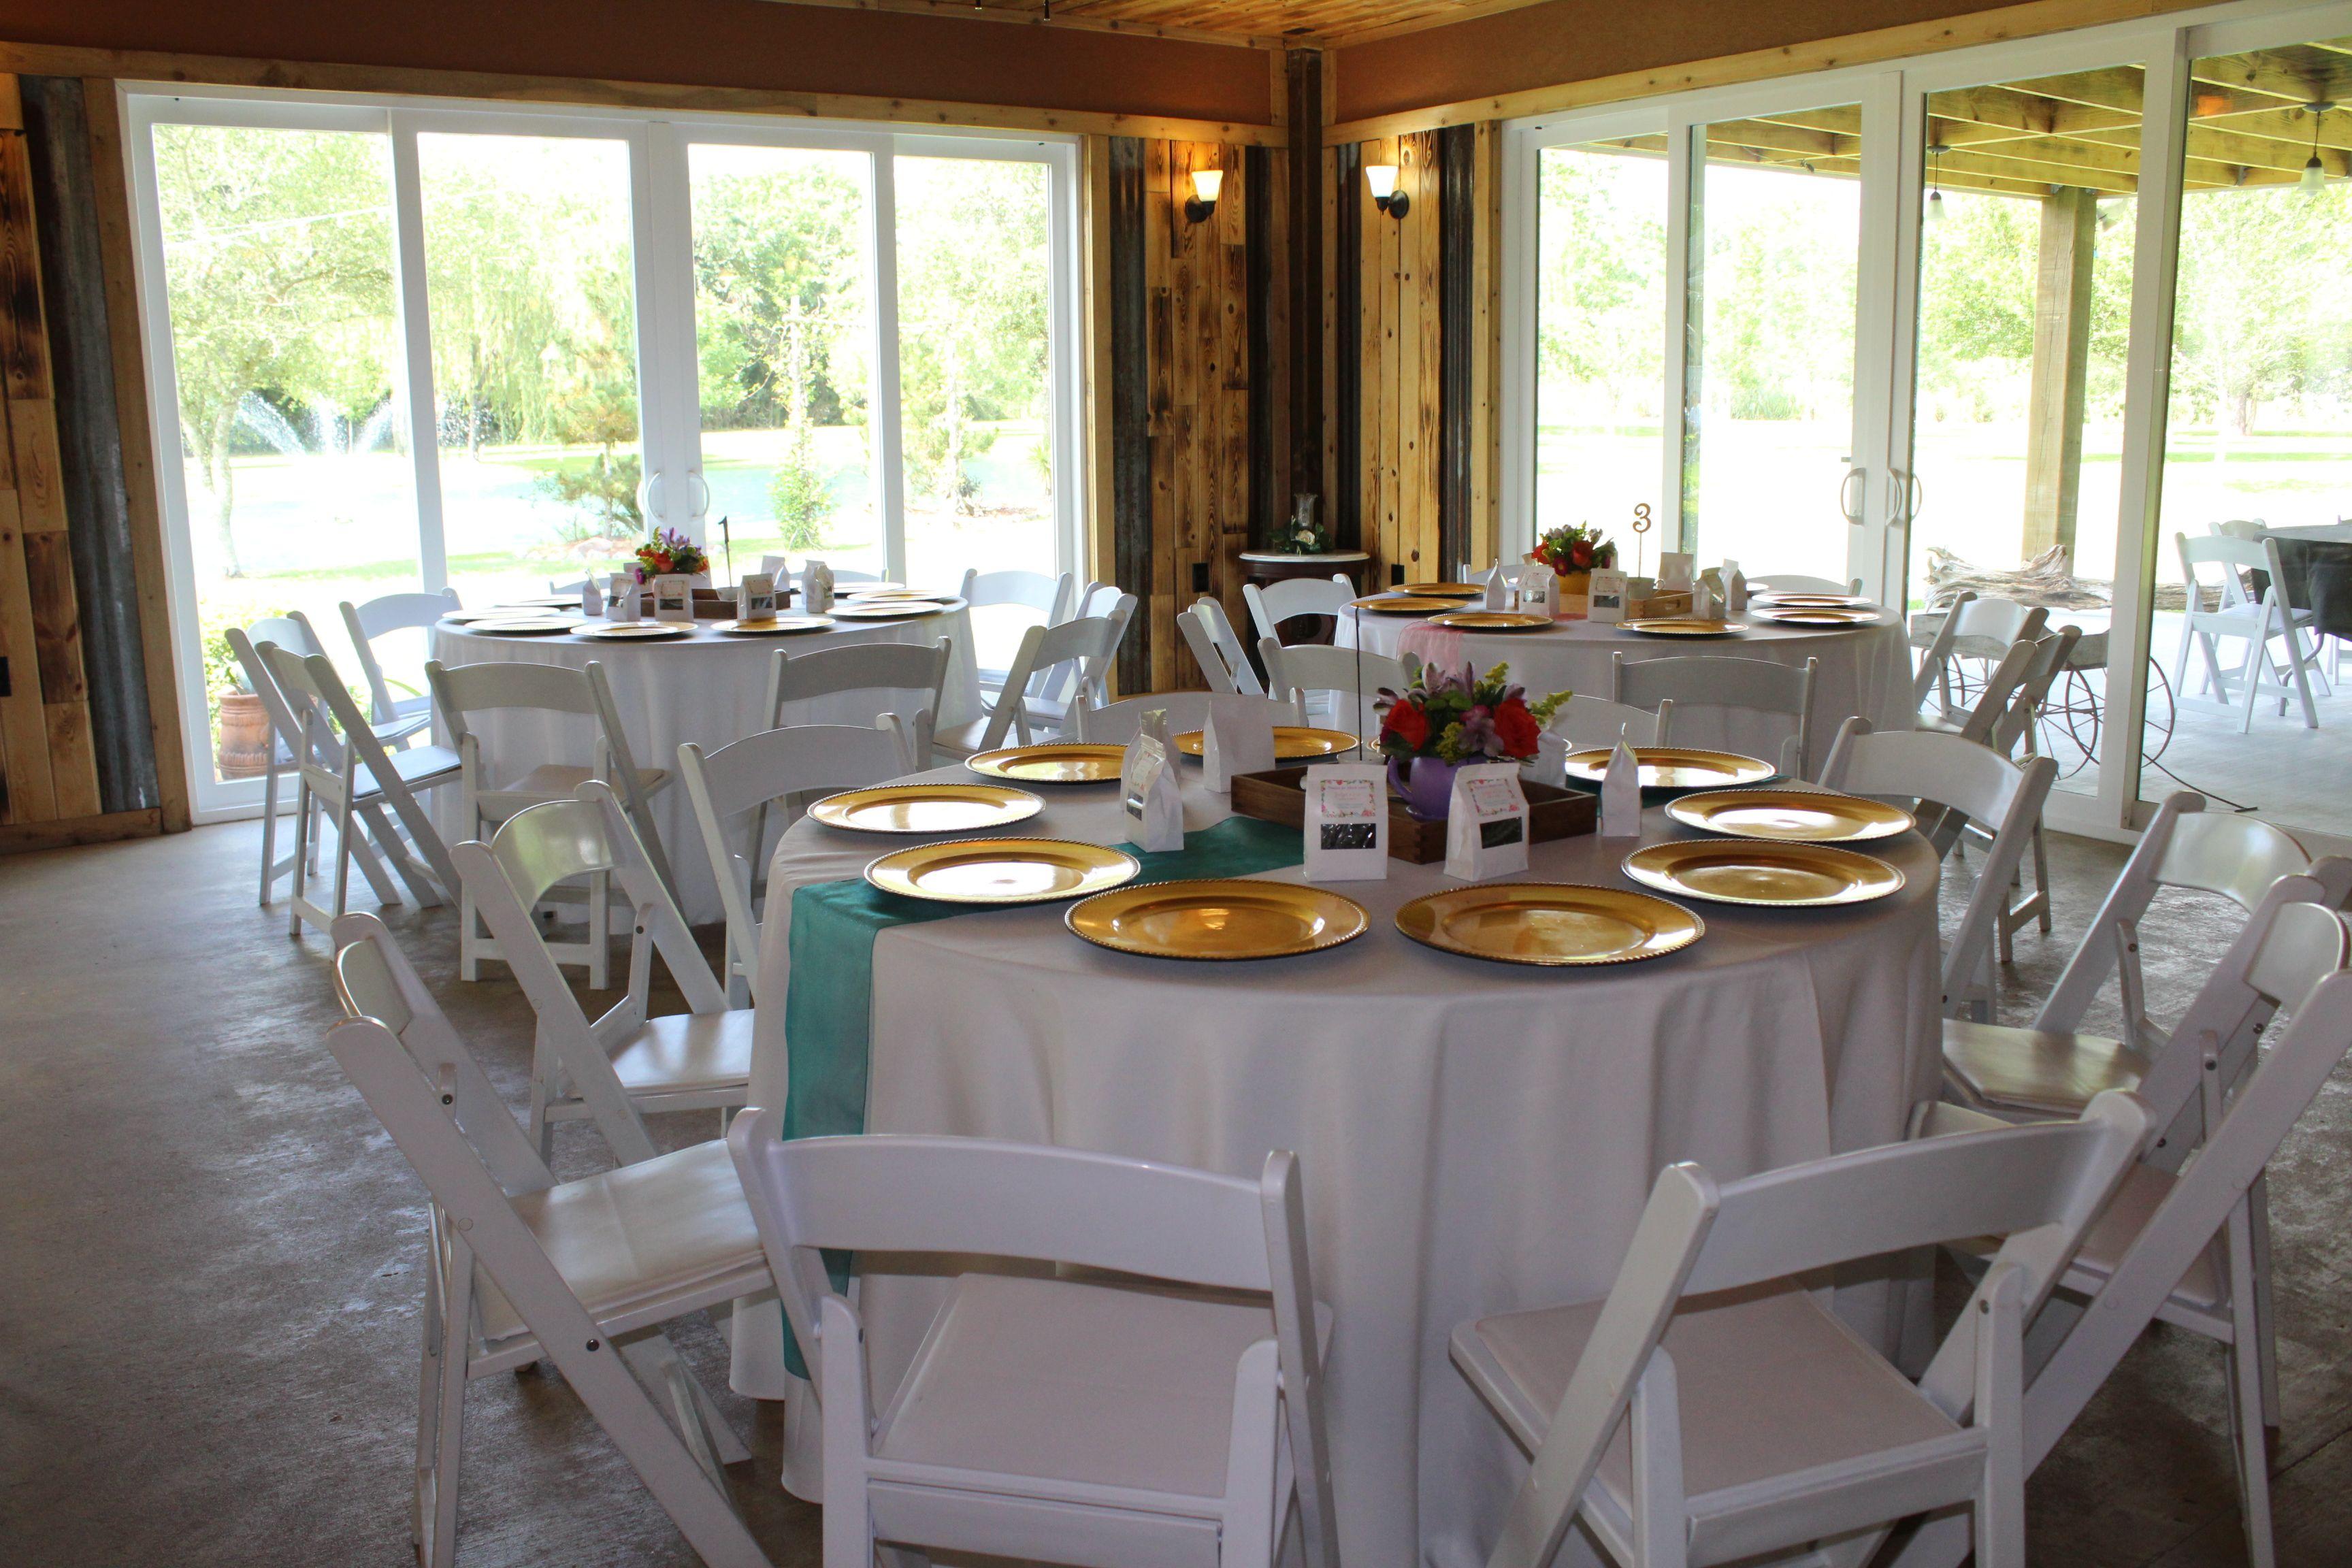 Bed Breakfast Theme Bed Breakfast Table Settings Decor